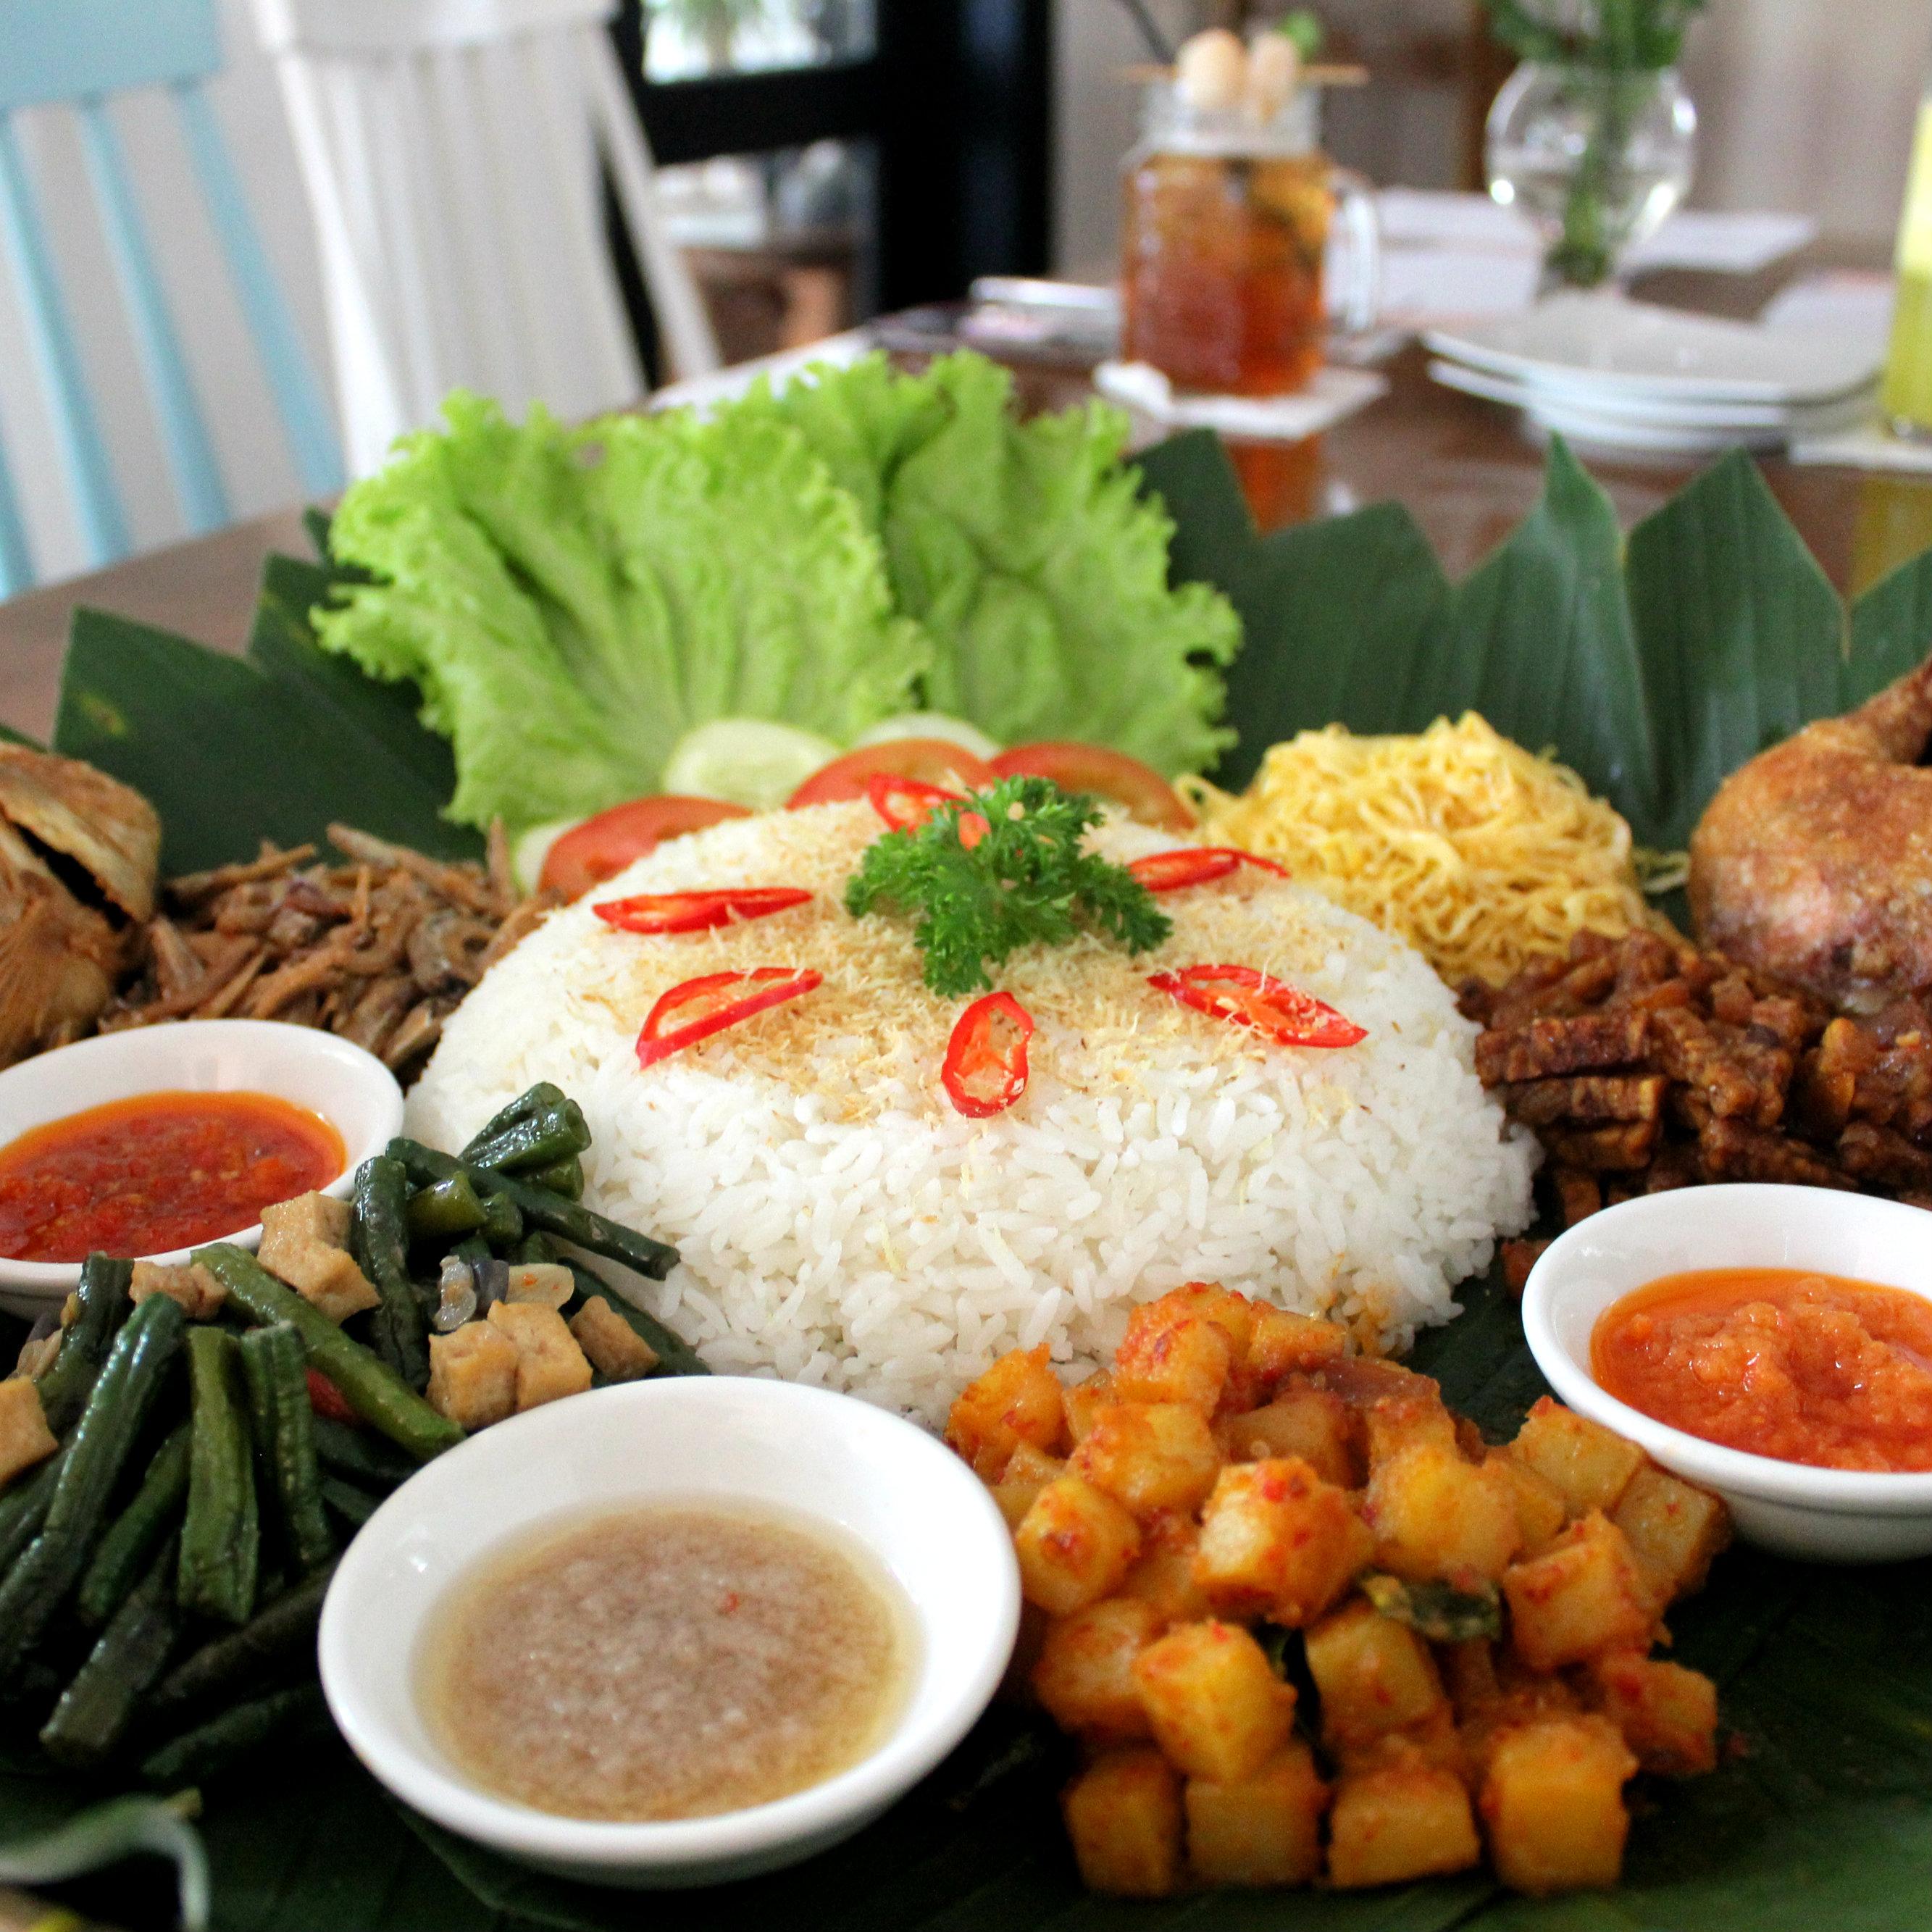 Yu Shang Menu: Makan Tengah Untuk Berbuka Puasa Di Gastromaquia